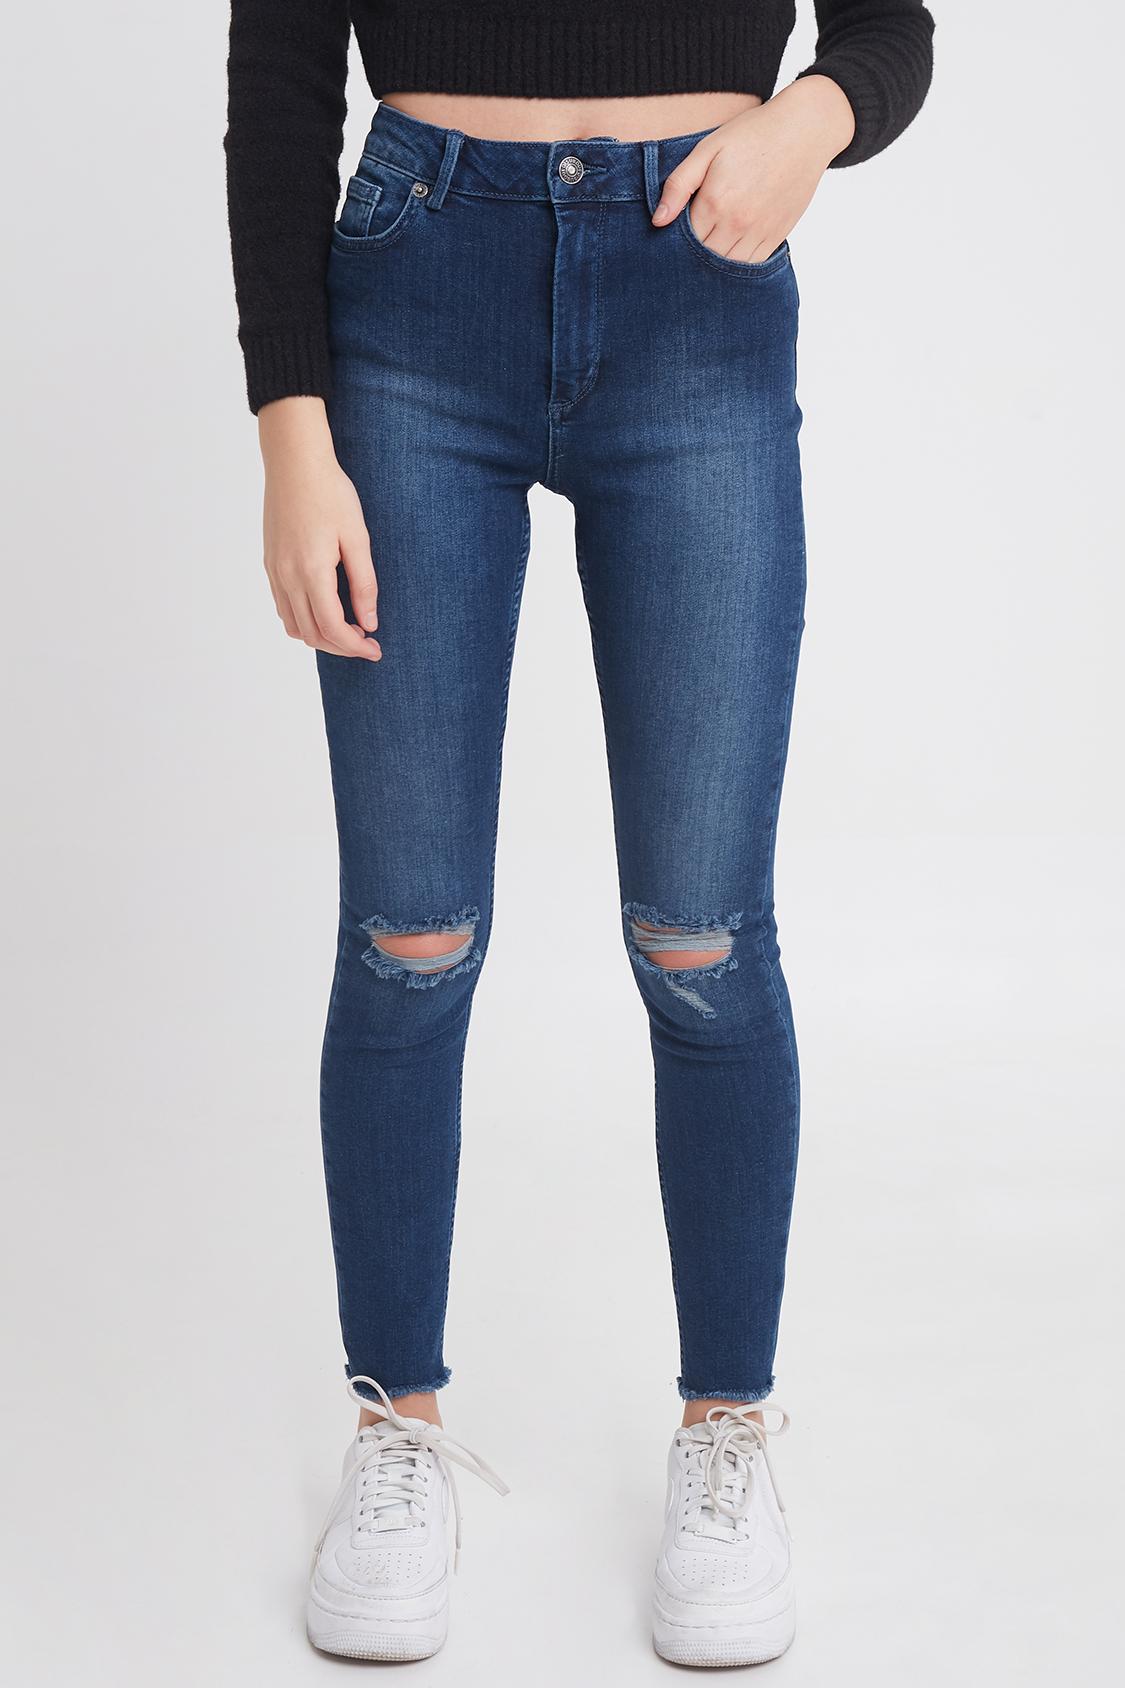 41b7505408ae Distressed skinny jeans